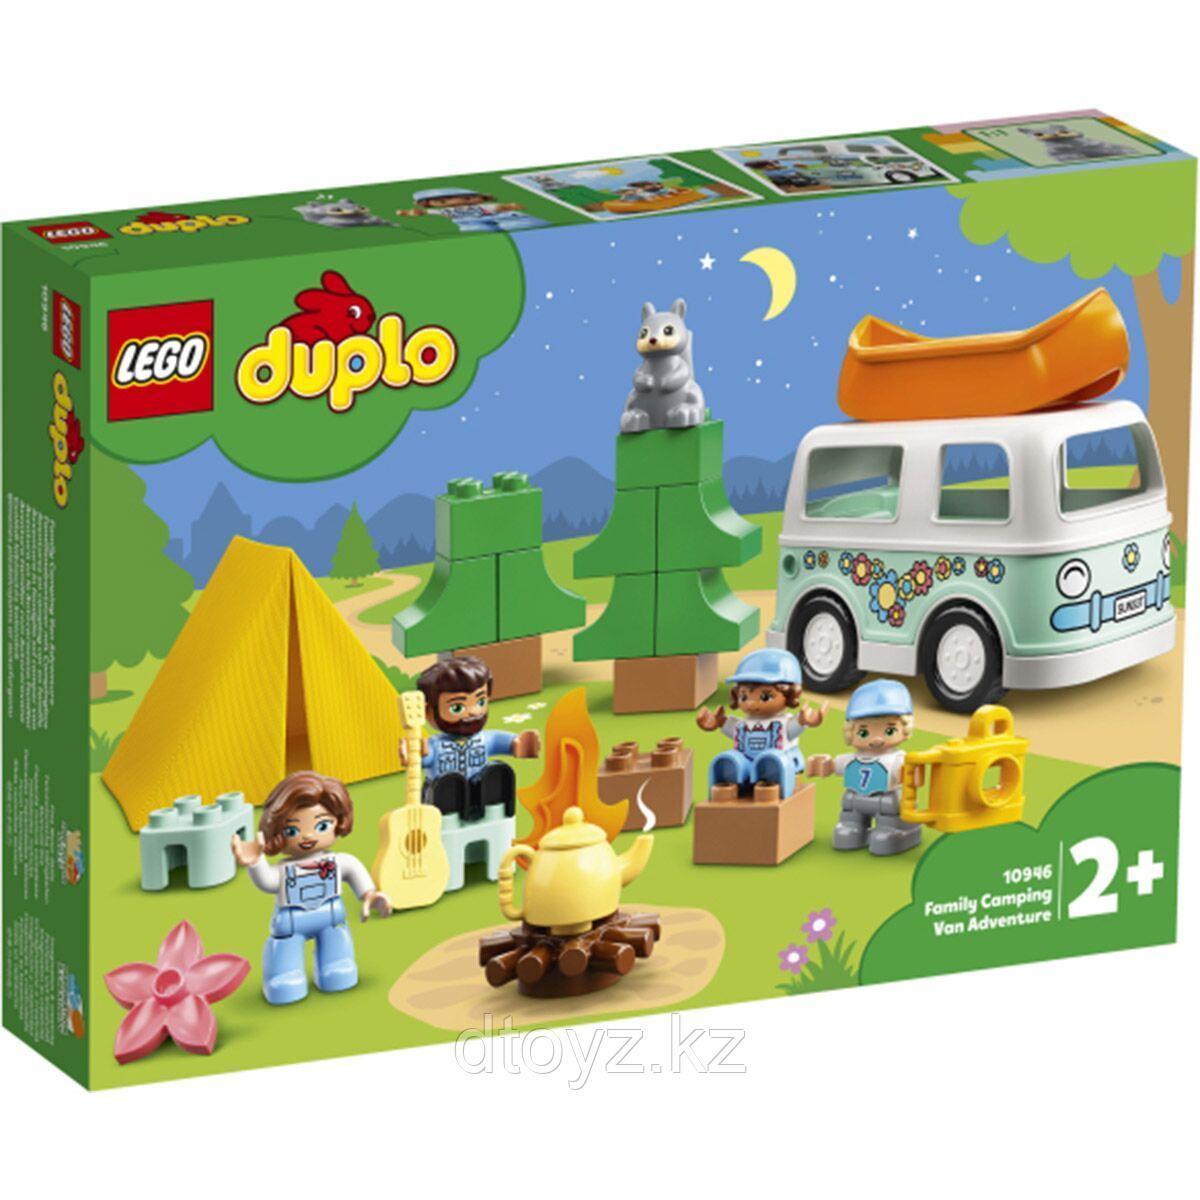 Lego Duplo Семейное приключение на микроавтобусе 10946